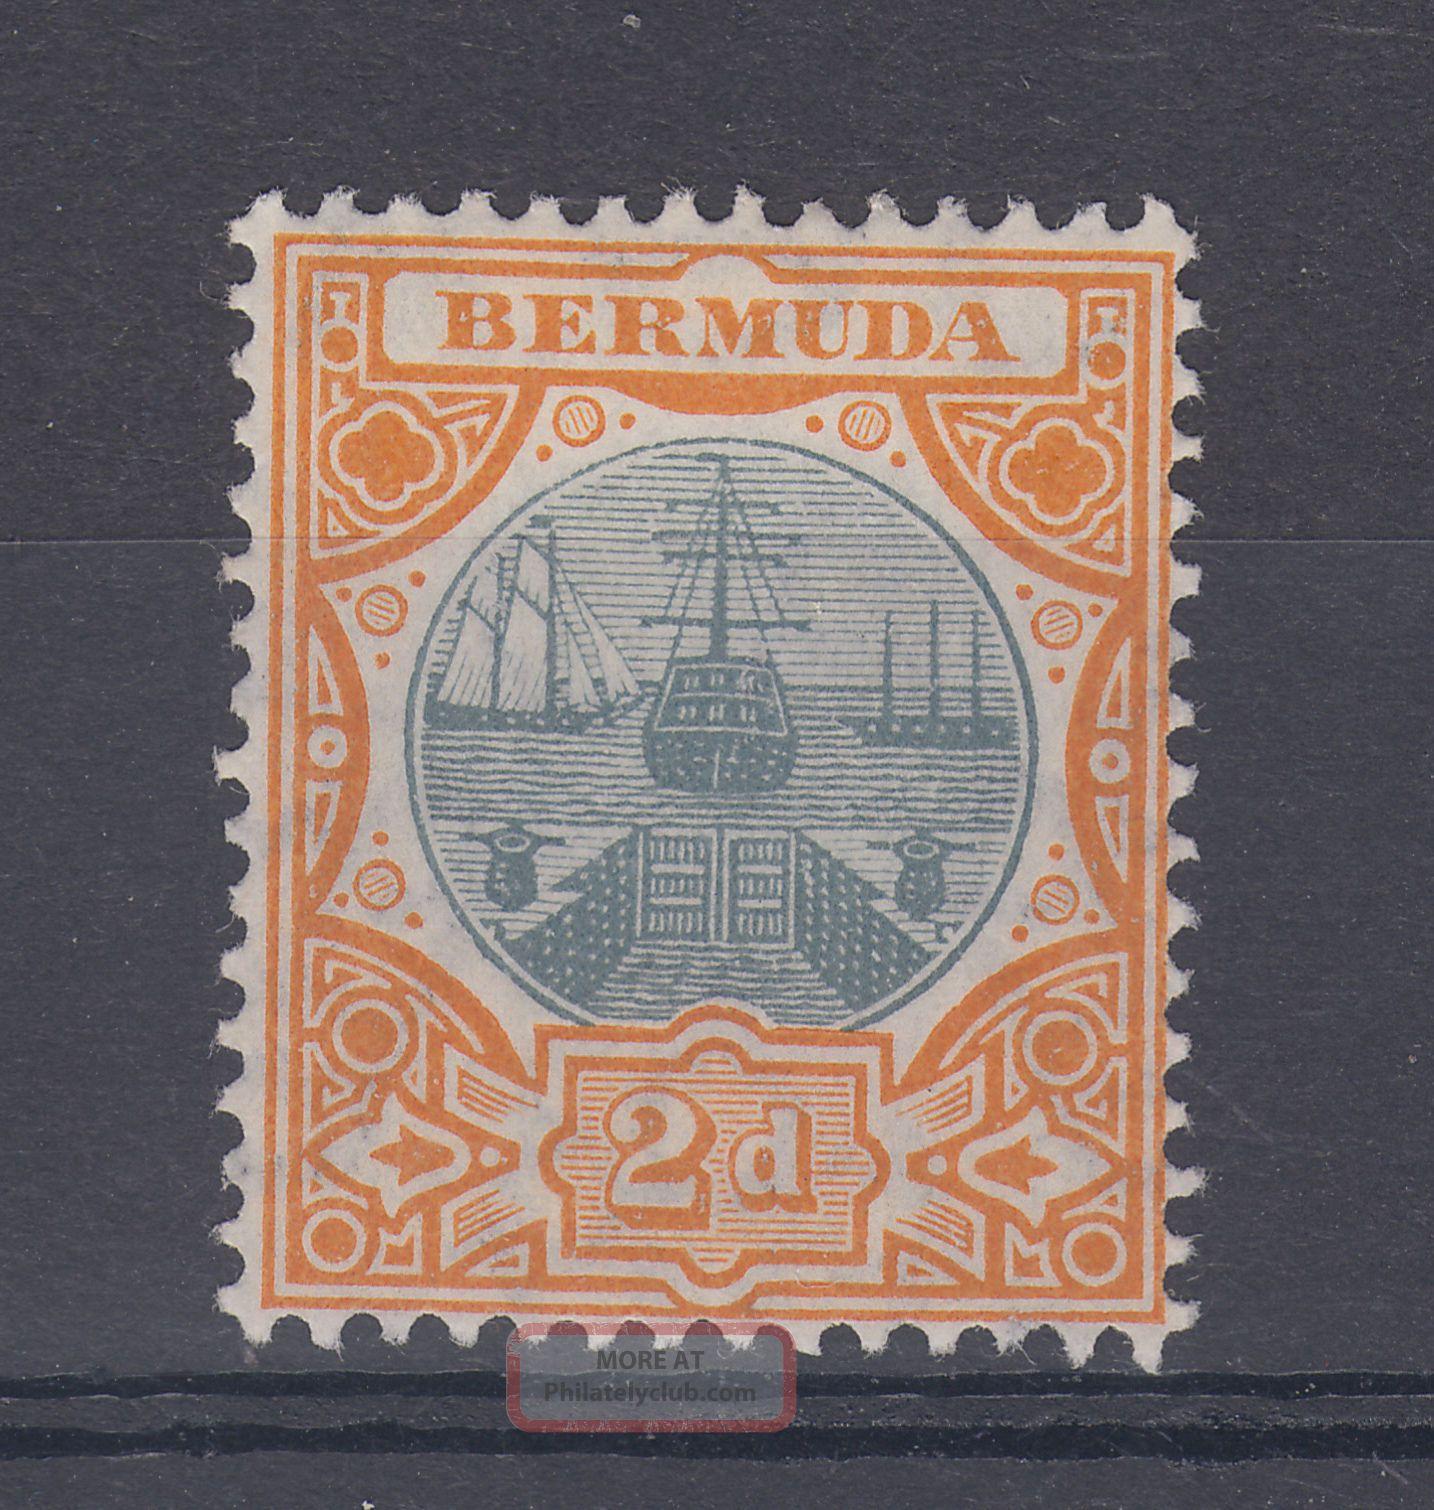 1907 Bermuda M/m Dry Dock 2d Stamp (sg 39) British Colonies & Territories photo